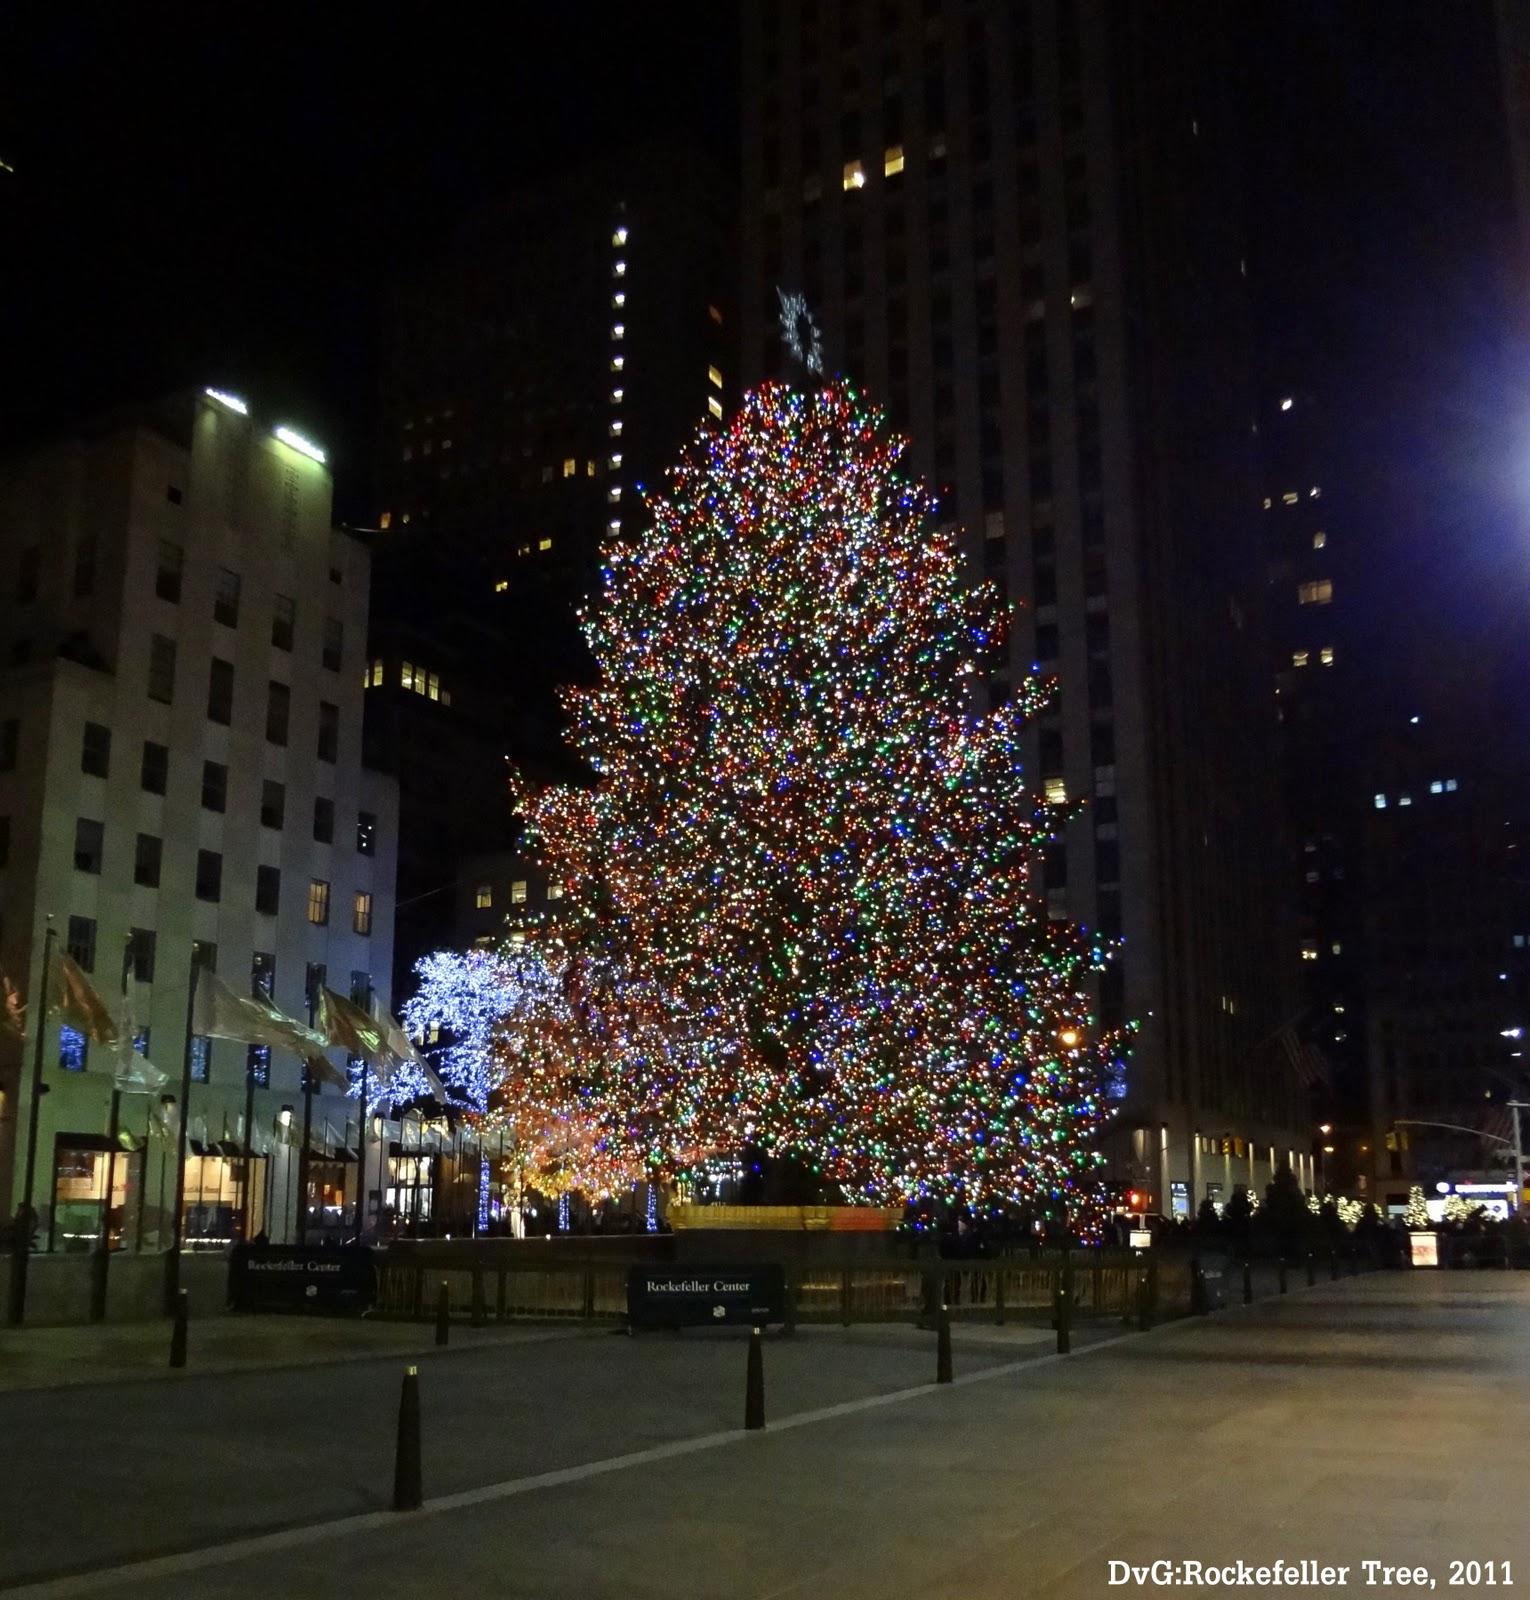 Rockefeller Christmas Tree Lighting 2014: NYC-2012